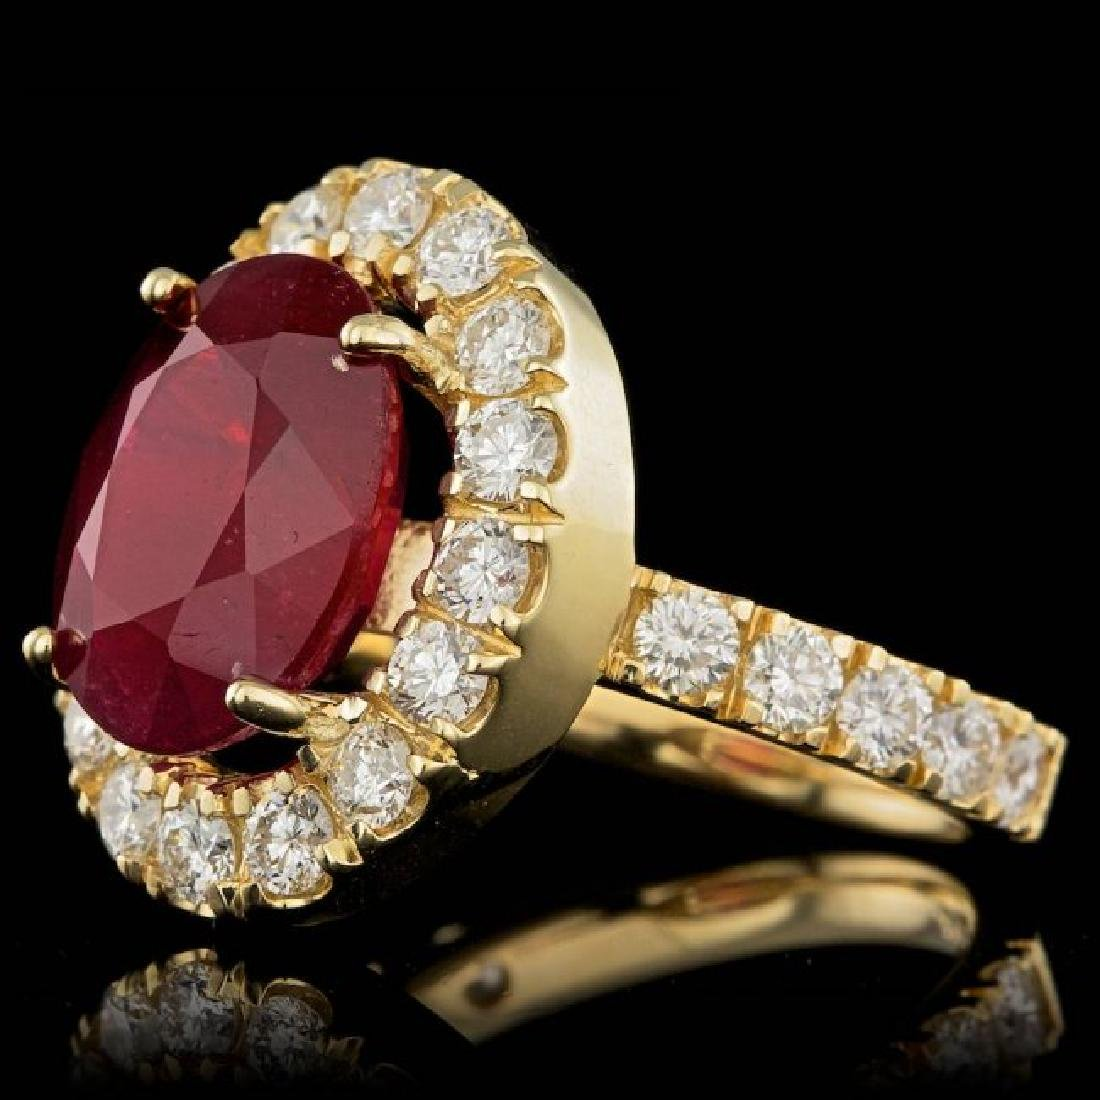 14k Yellow Gold 7.50ct Ruby 1.70ct Diamond Ring - 2